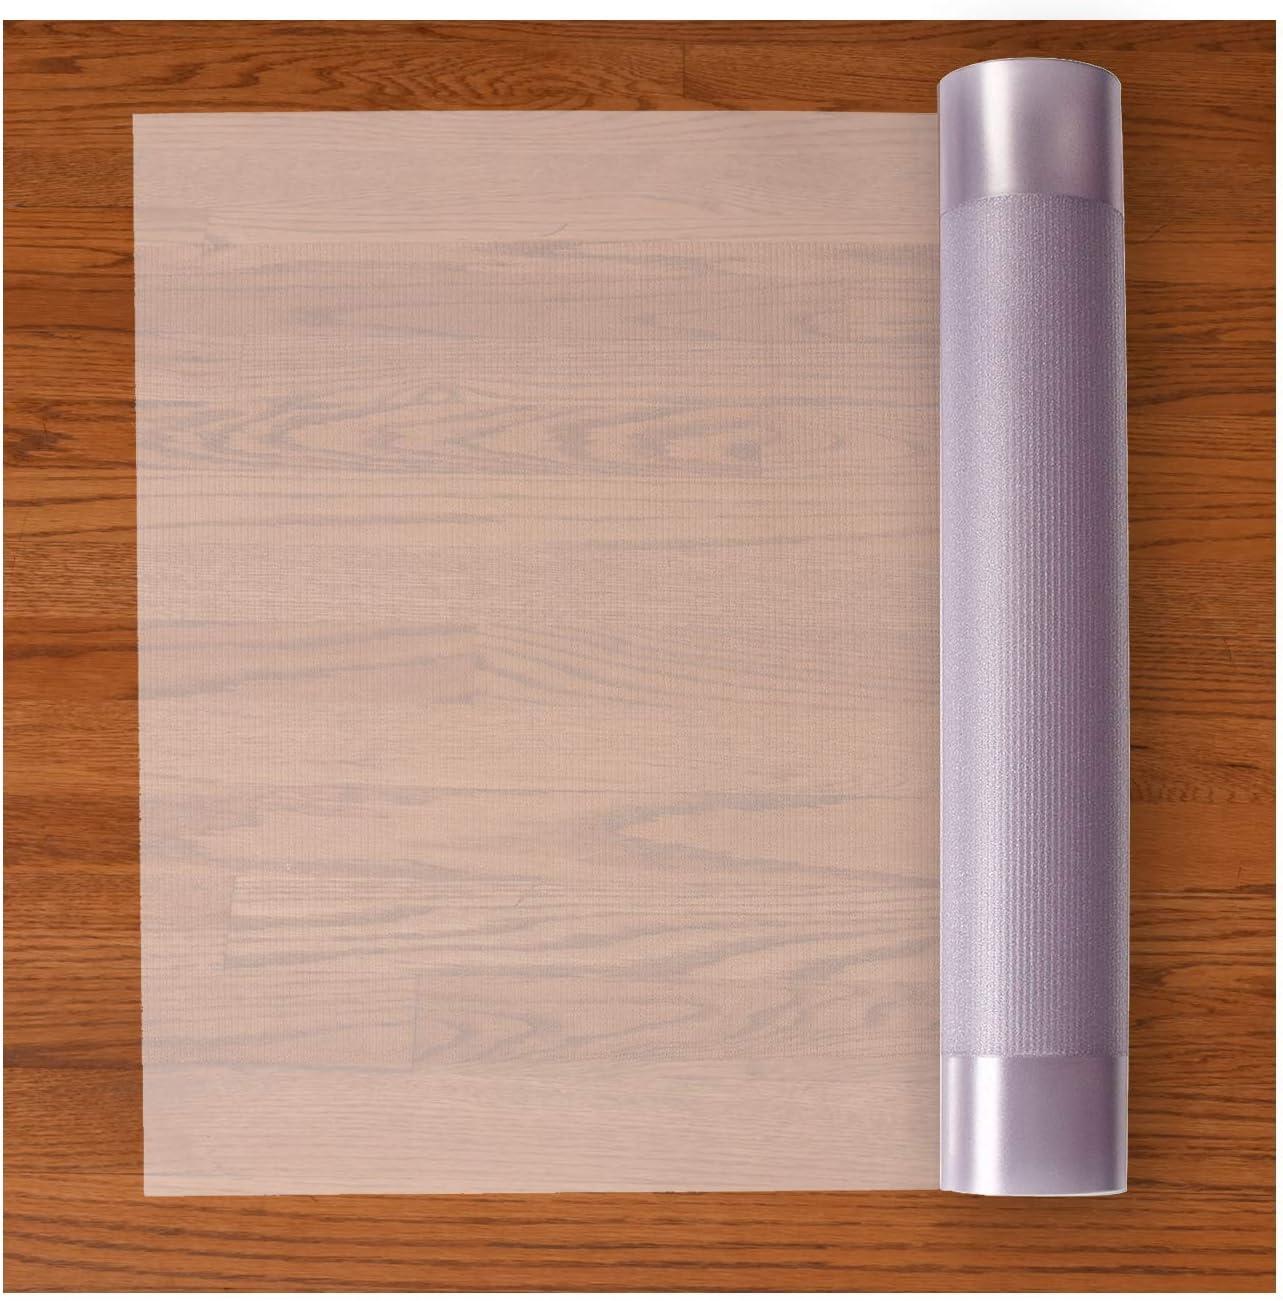 Resilia Premium Heavy Duty Floor Runner/Protector for Hardwood Floors – Non-Skid, Clear, Plastic Vinyl, 27 Inches x 25 Feet